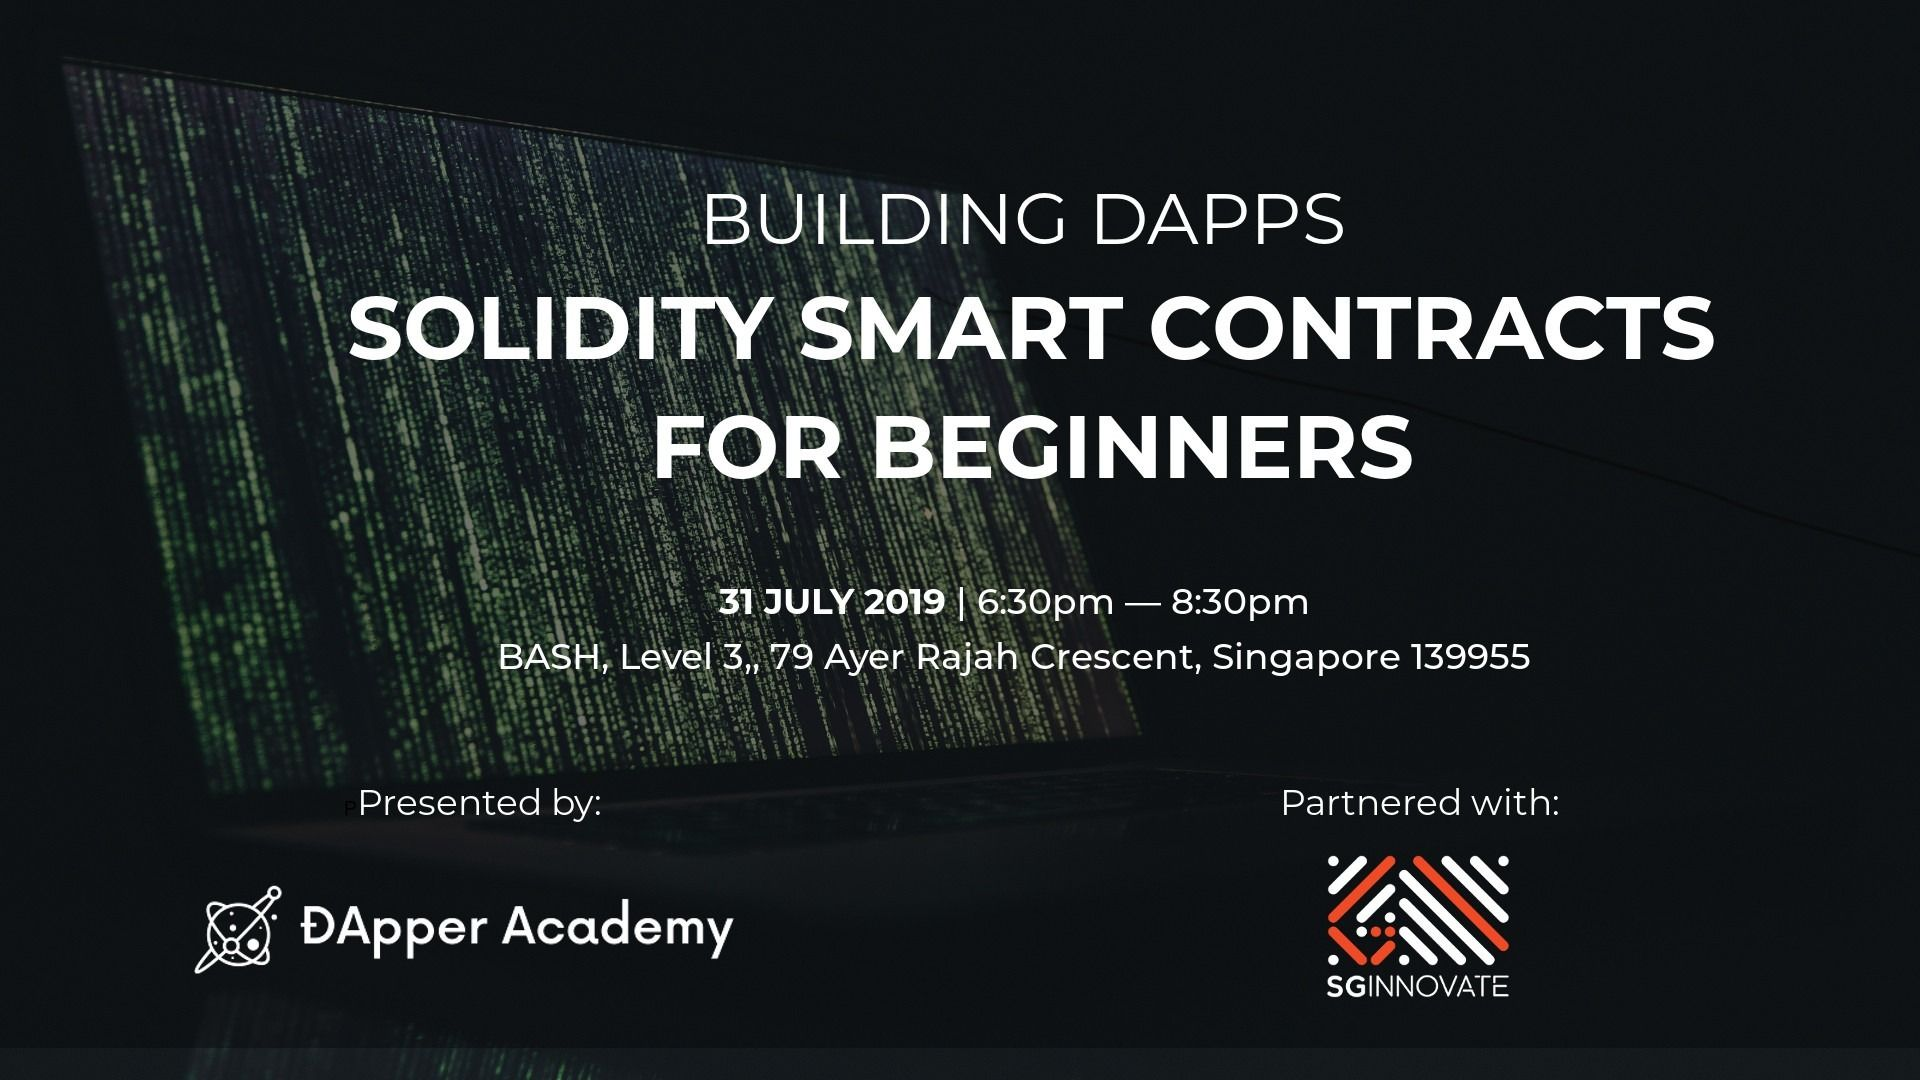 Web3 Singapore - Learn Blockchain & ÐApp Development